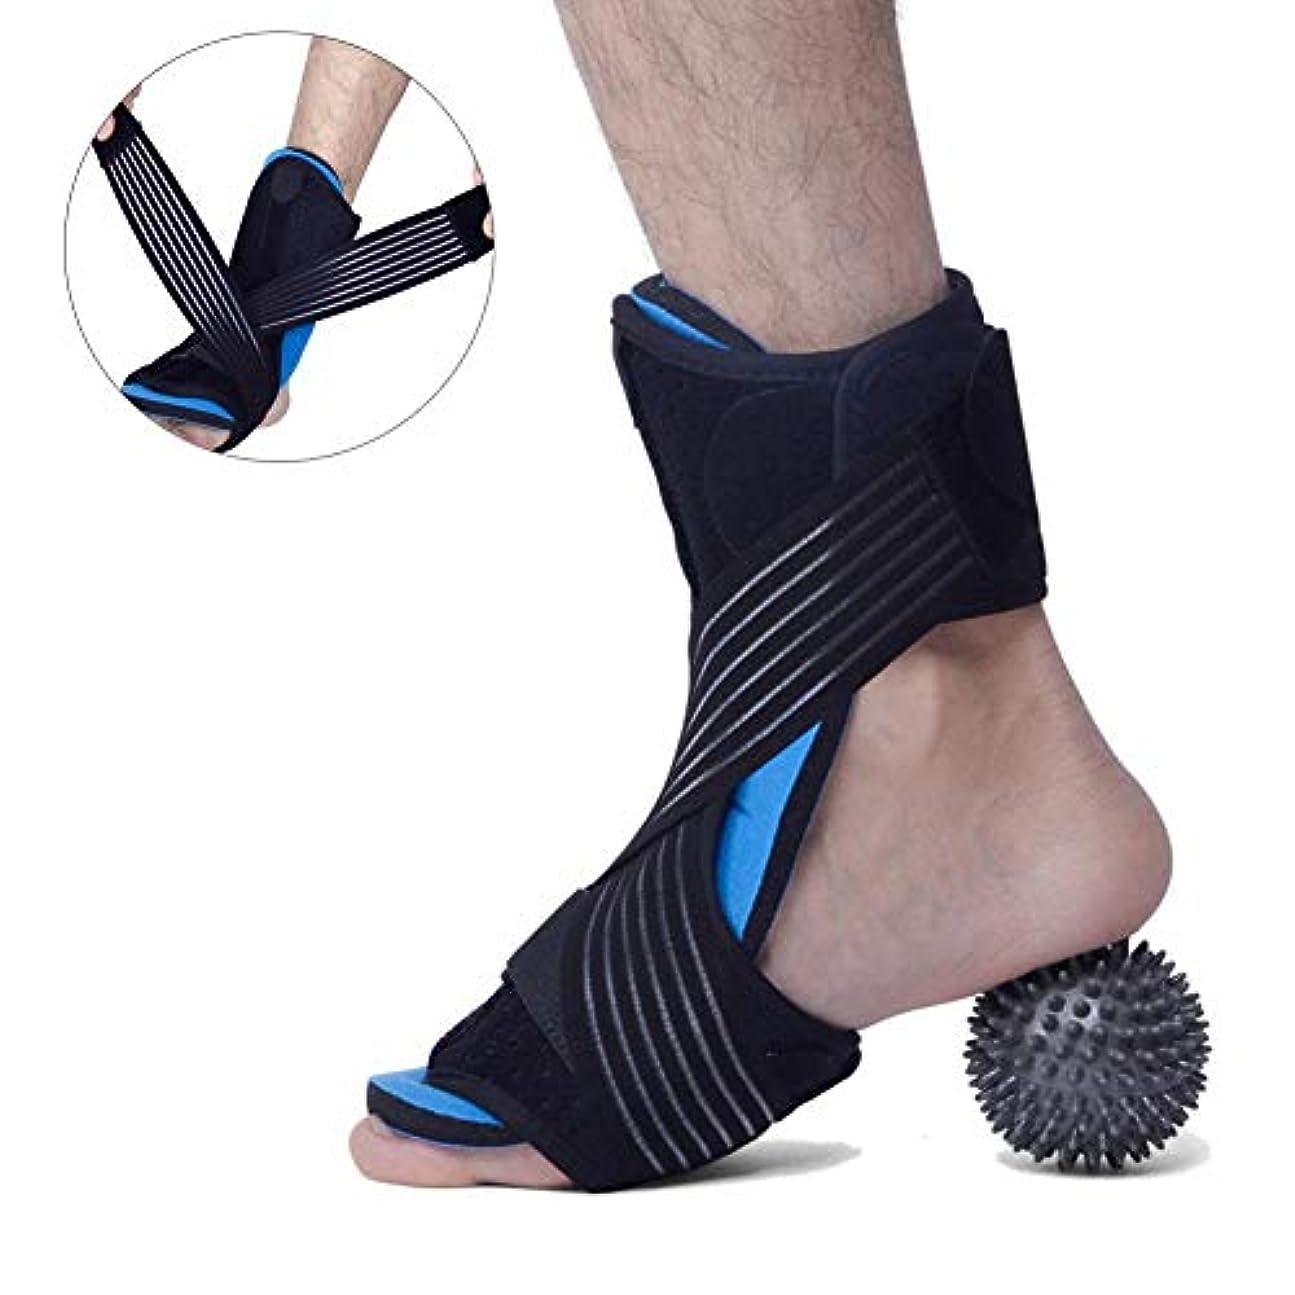 Brill(ブリーオ) マッサージ ボール 付き 調節 可能 な 足首 サポート スタビライザー 足底 筋 膜 炎 ナイト スプリント 足 装具 サポート 足底 筋 膜 炎 の 効果 の な 緩和 痛み 足底 筋 膜 炎